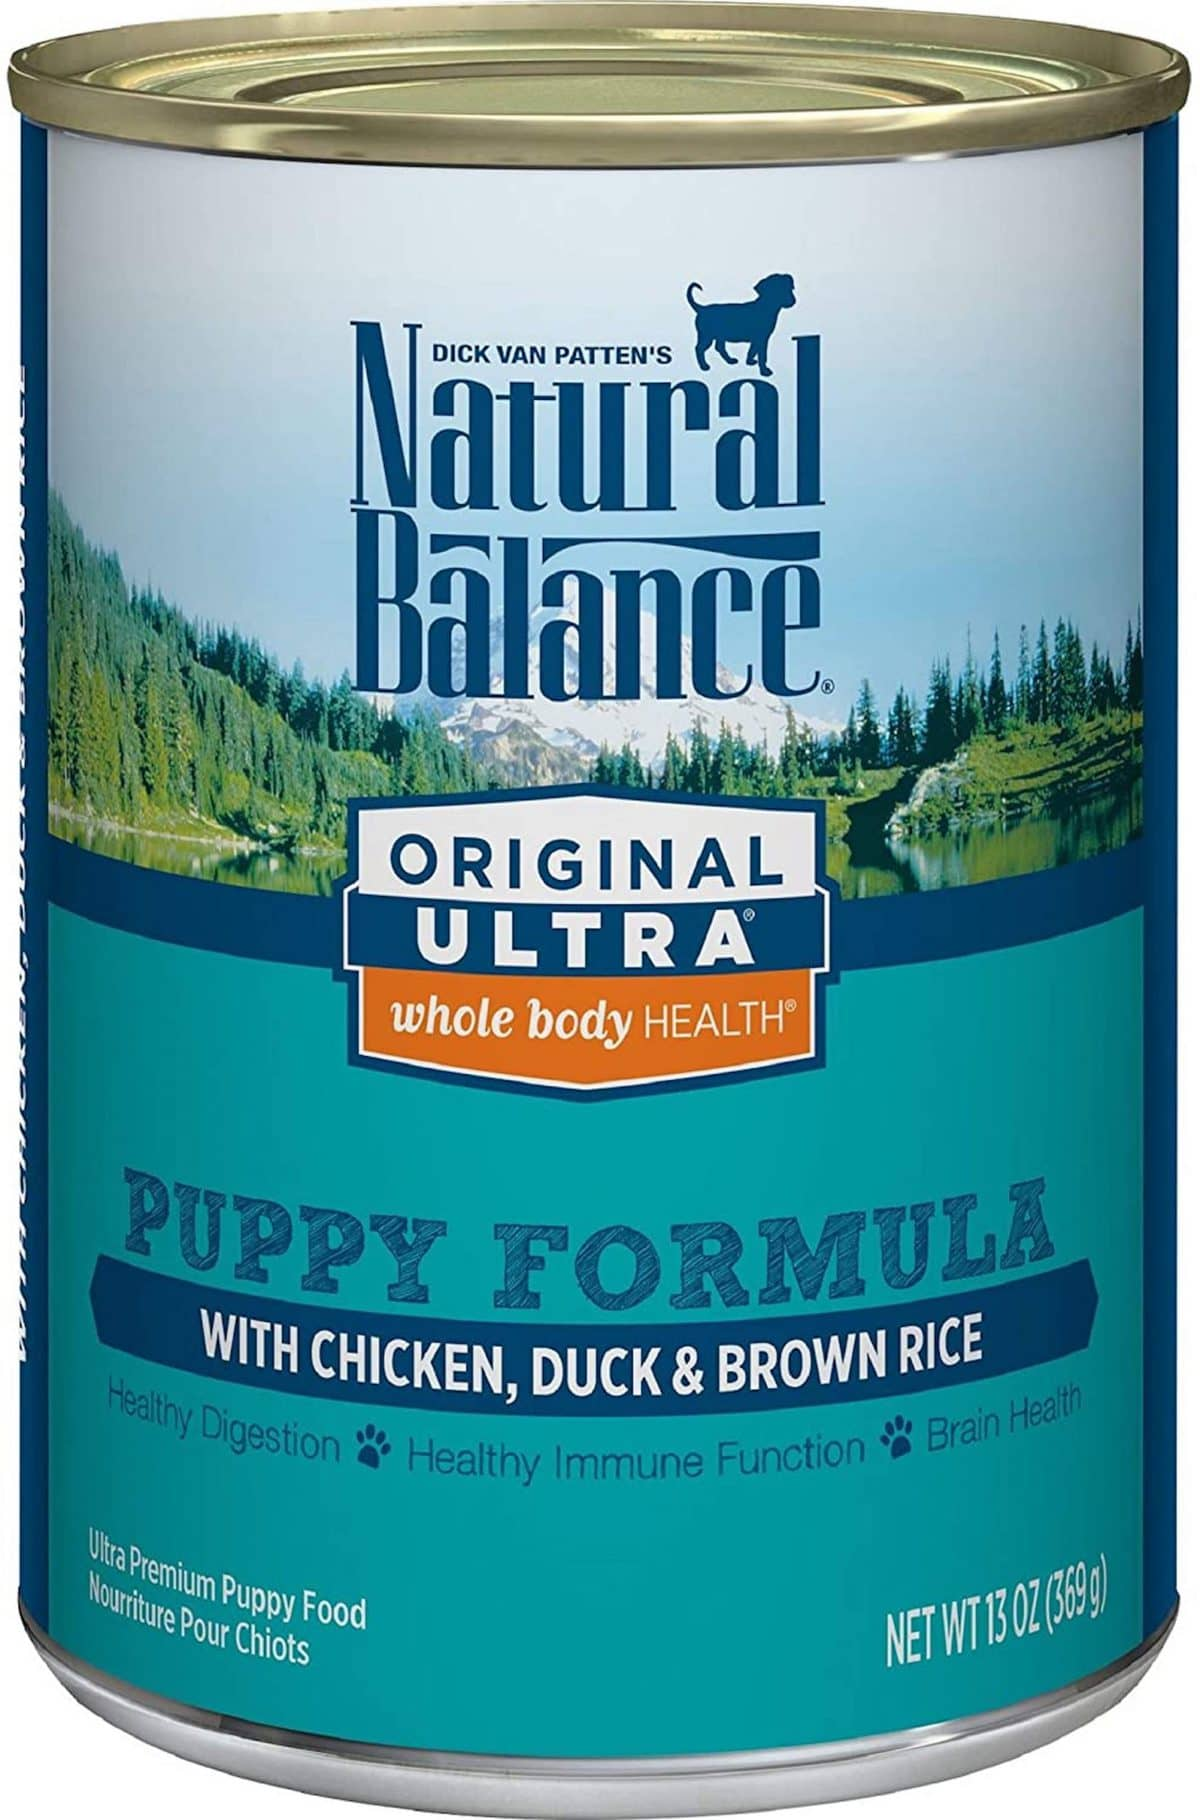 Natural Balance Original Ultra Whole Body Health Wet Food